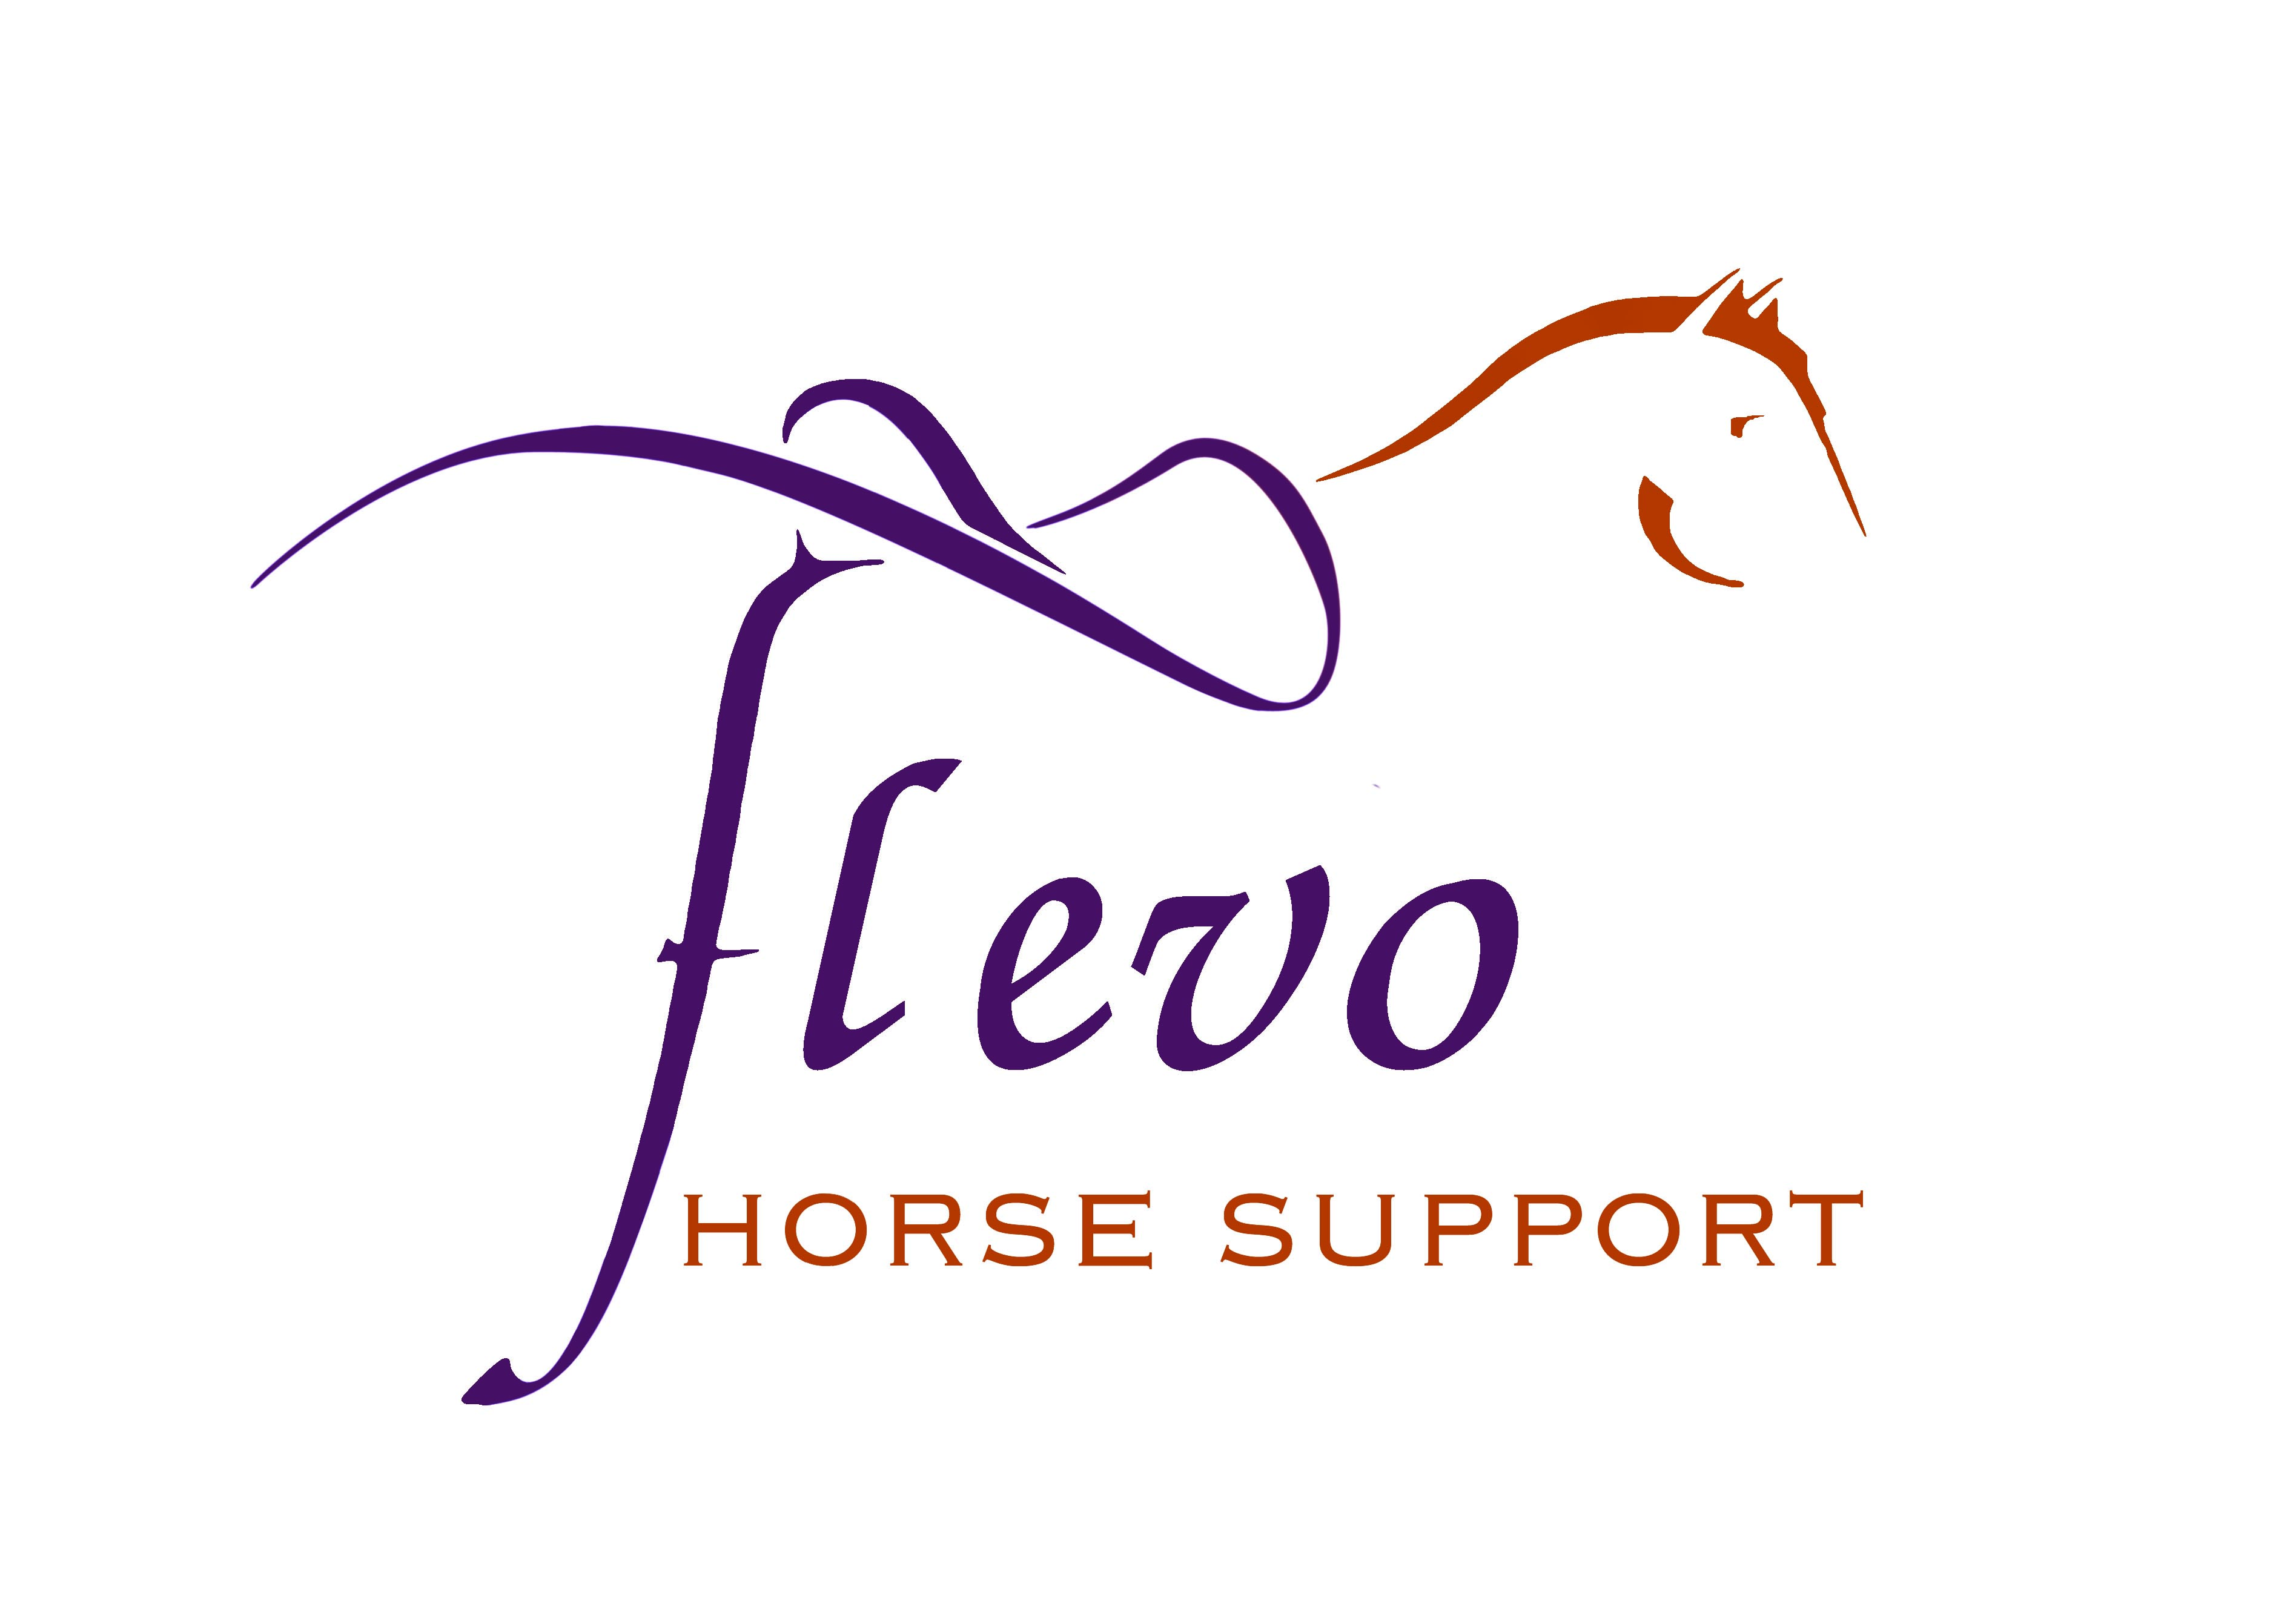 Flevo Horse Support